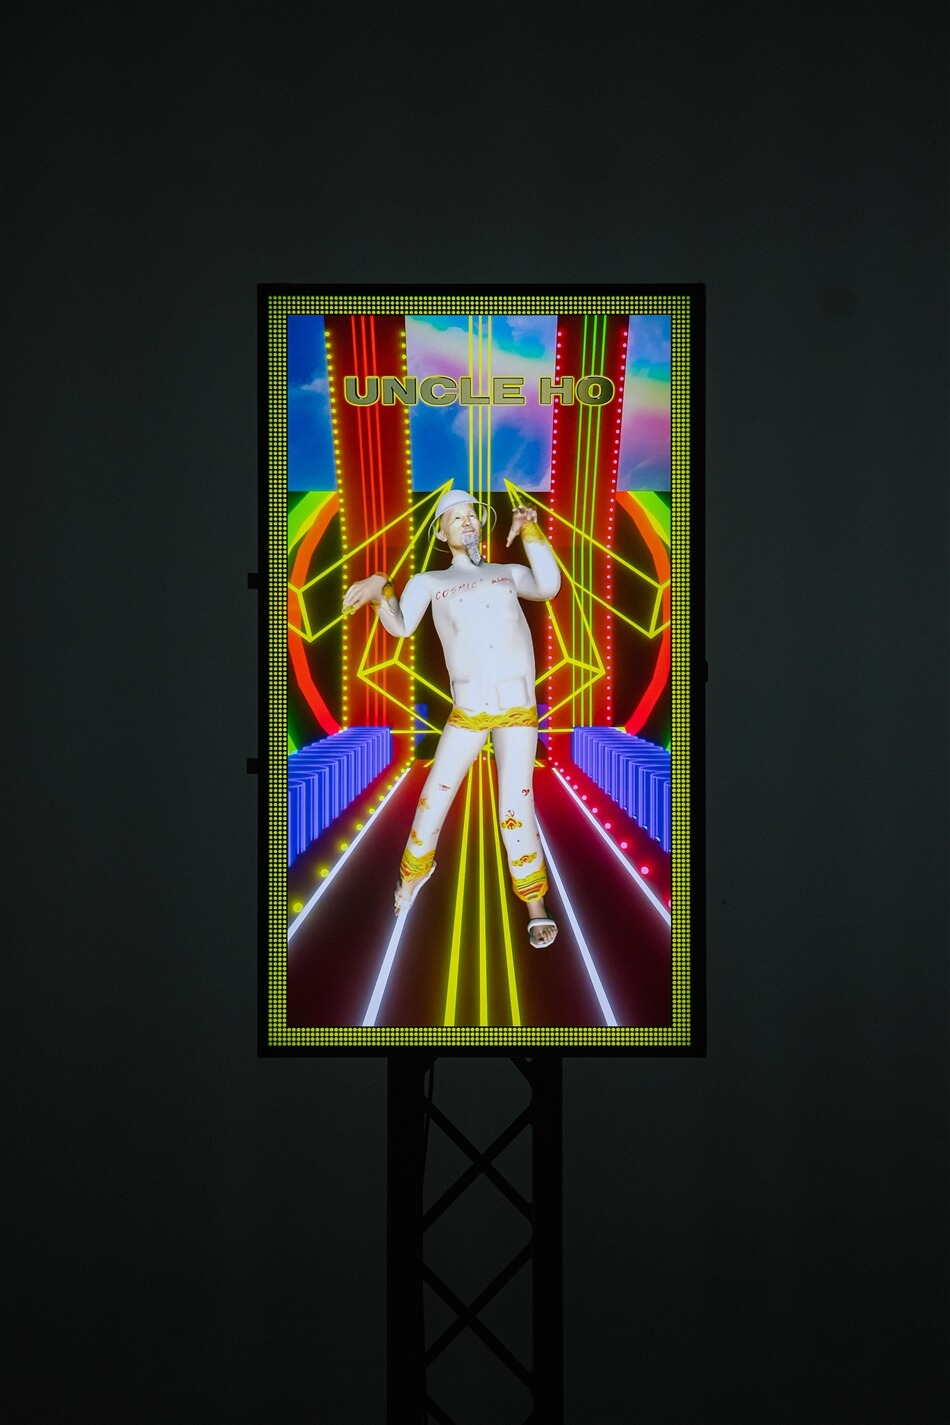 Detail Choy Ka Fai, Getai Of Virtual Gods , 2021 Image Courtesy Of Singapore Art Museum